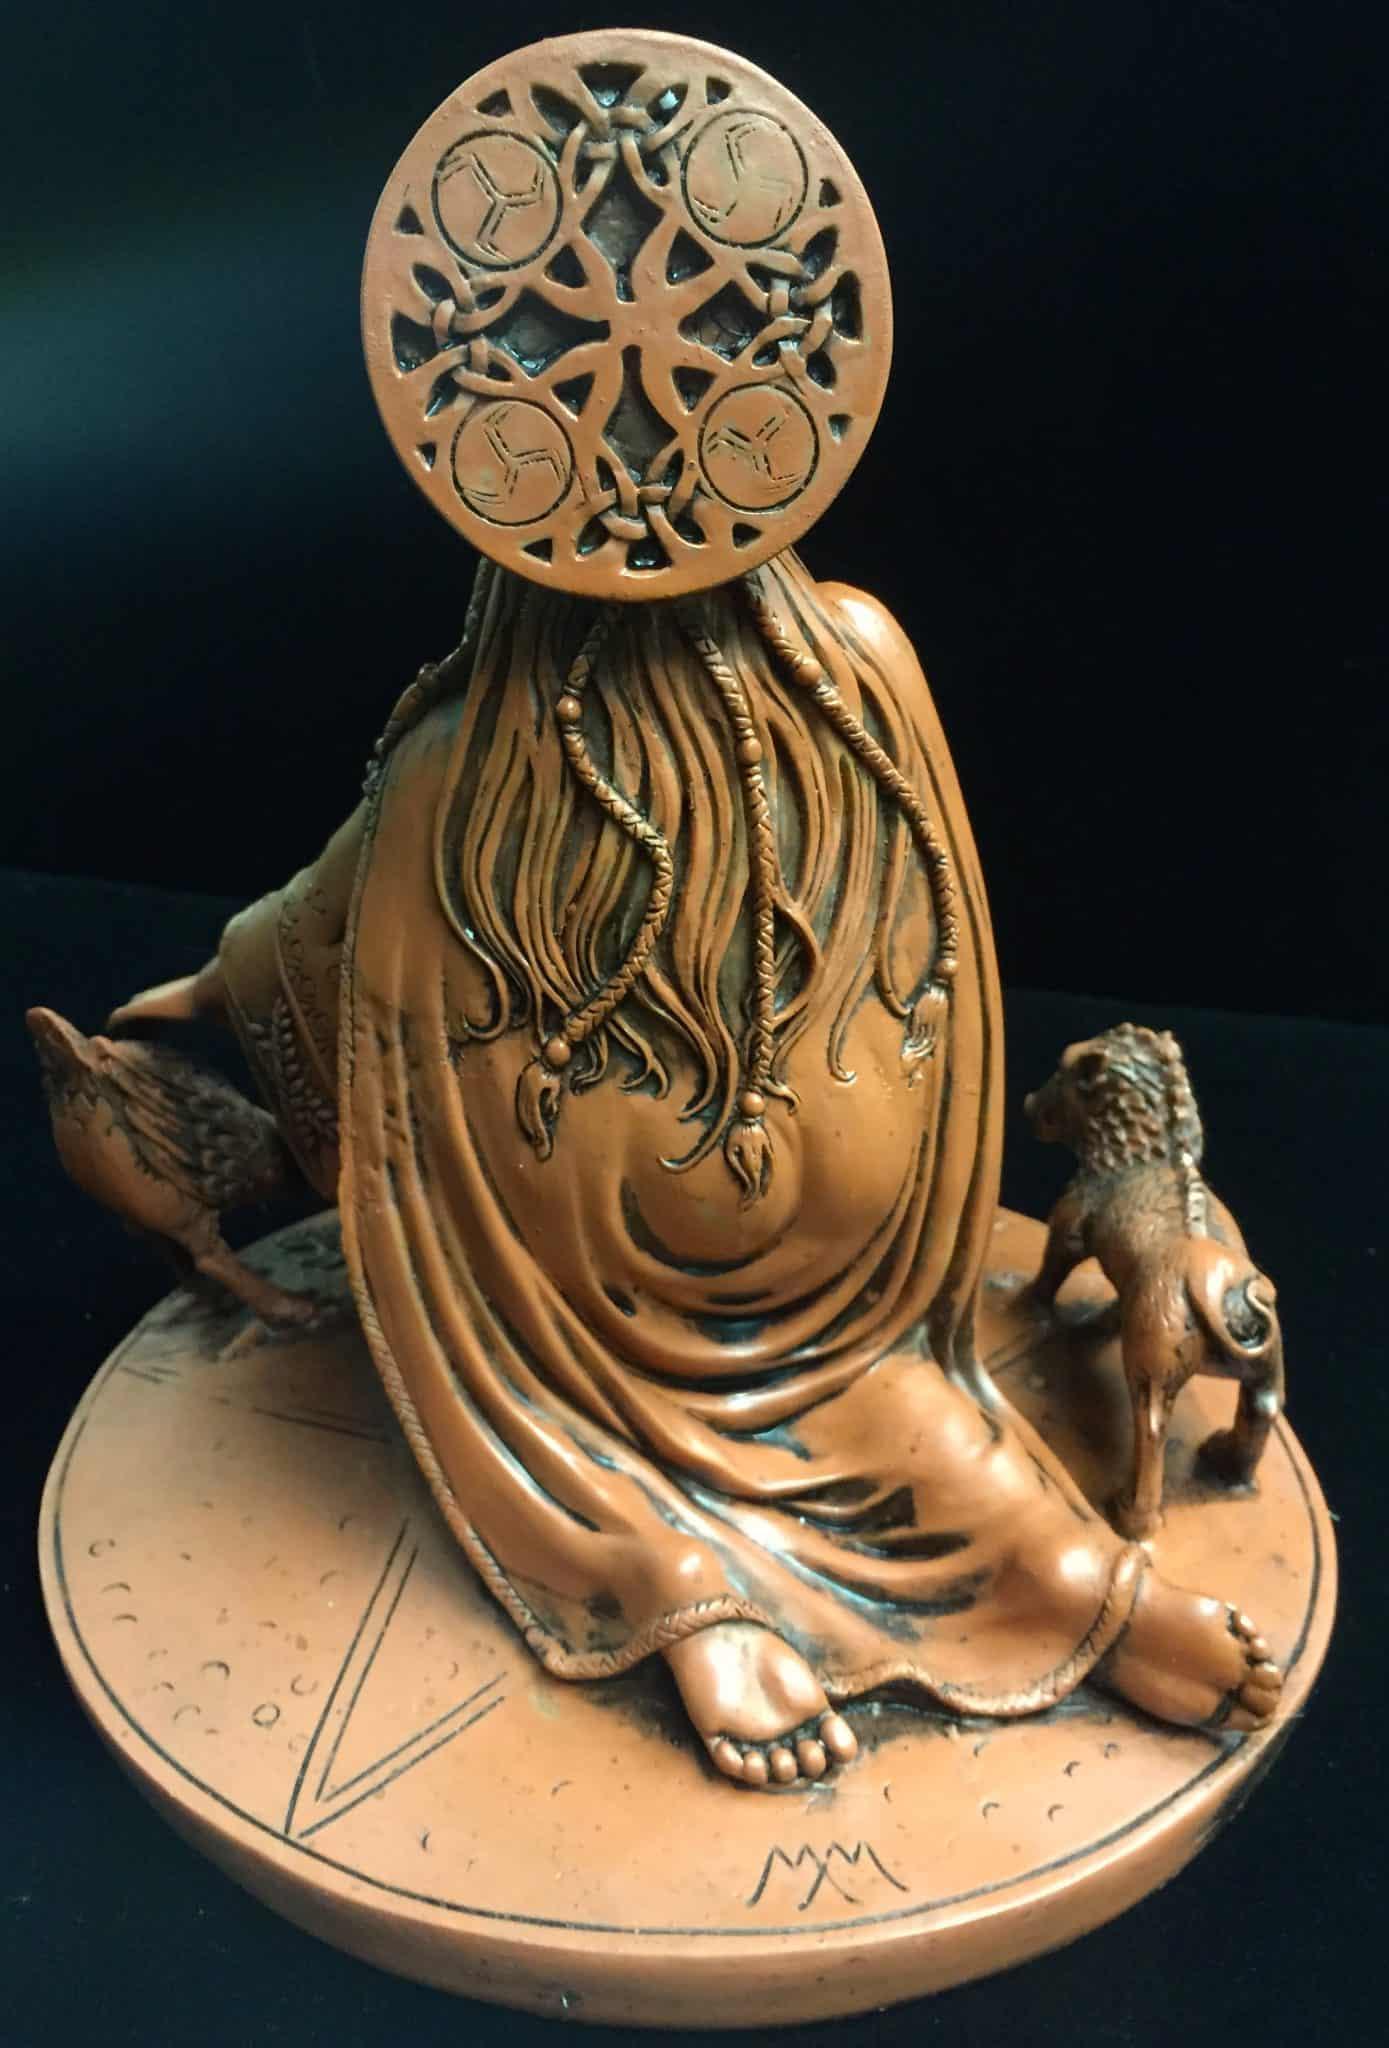 Celtic Crone Goddess Cerridwen Terracotta Resin Statue by Maxine Miller ©Maxine Miller - Rear View